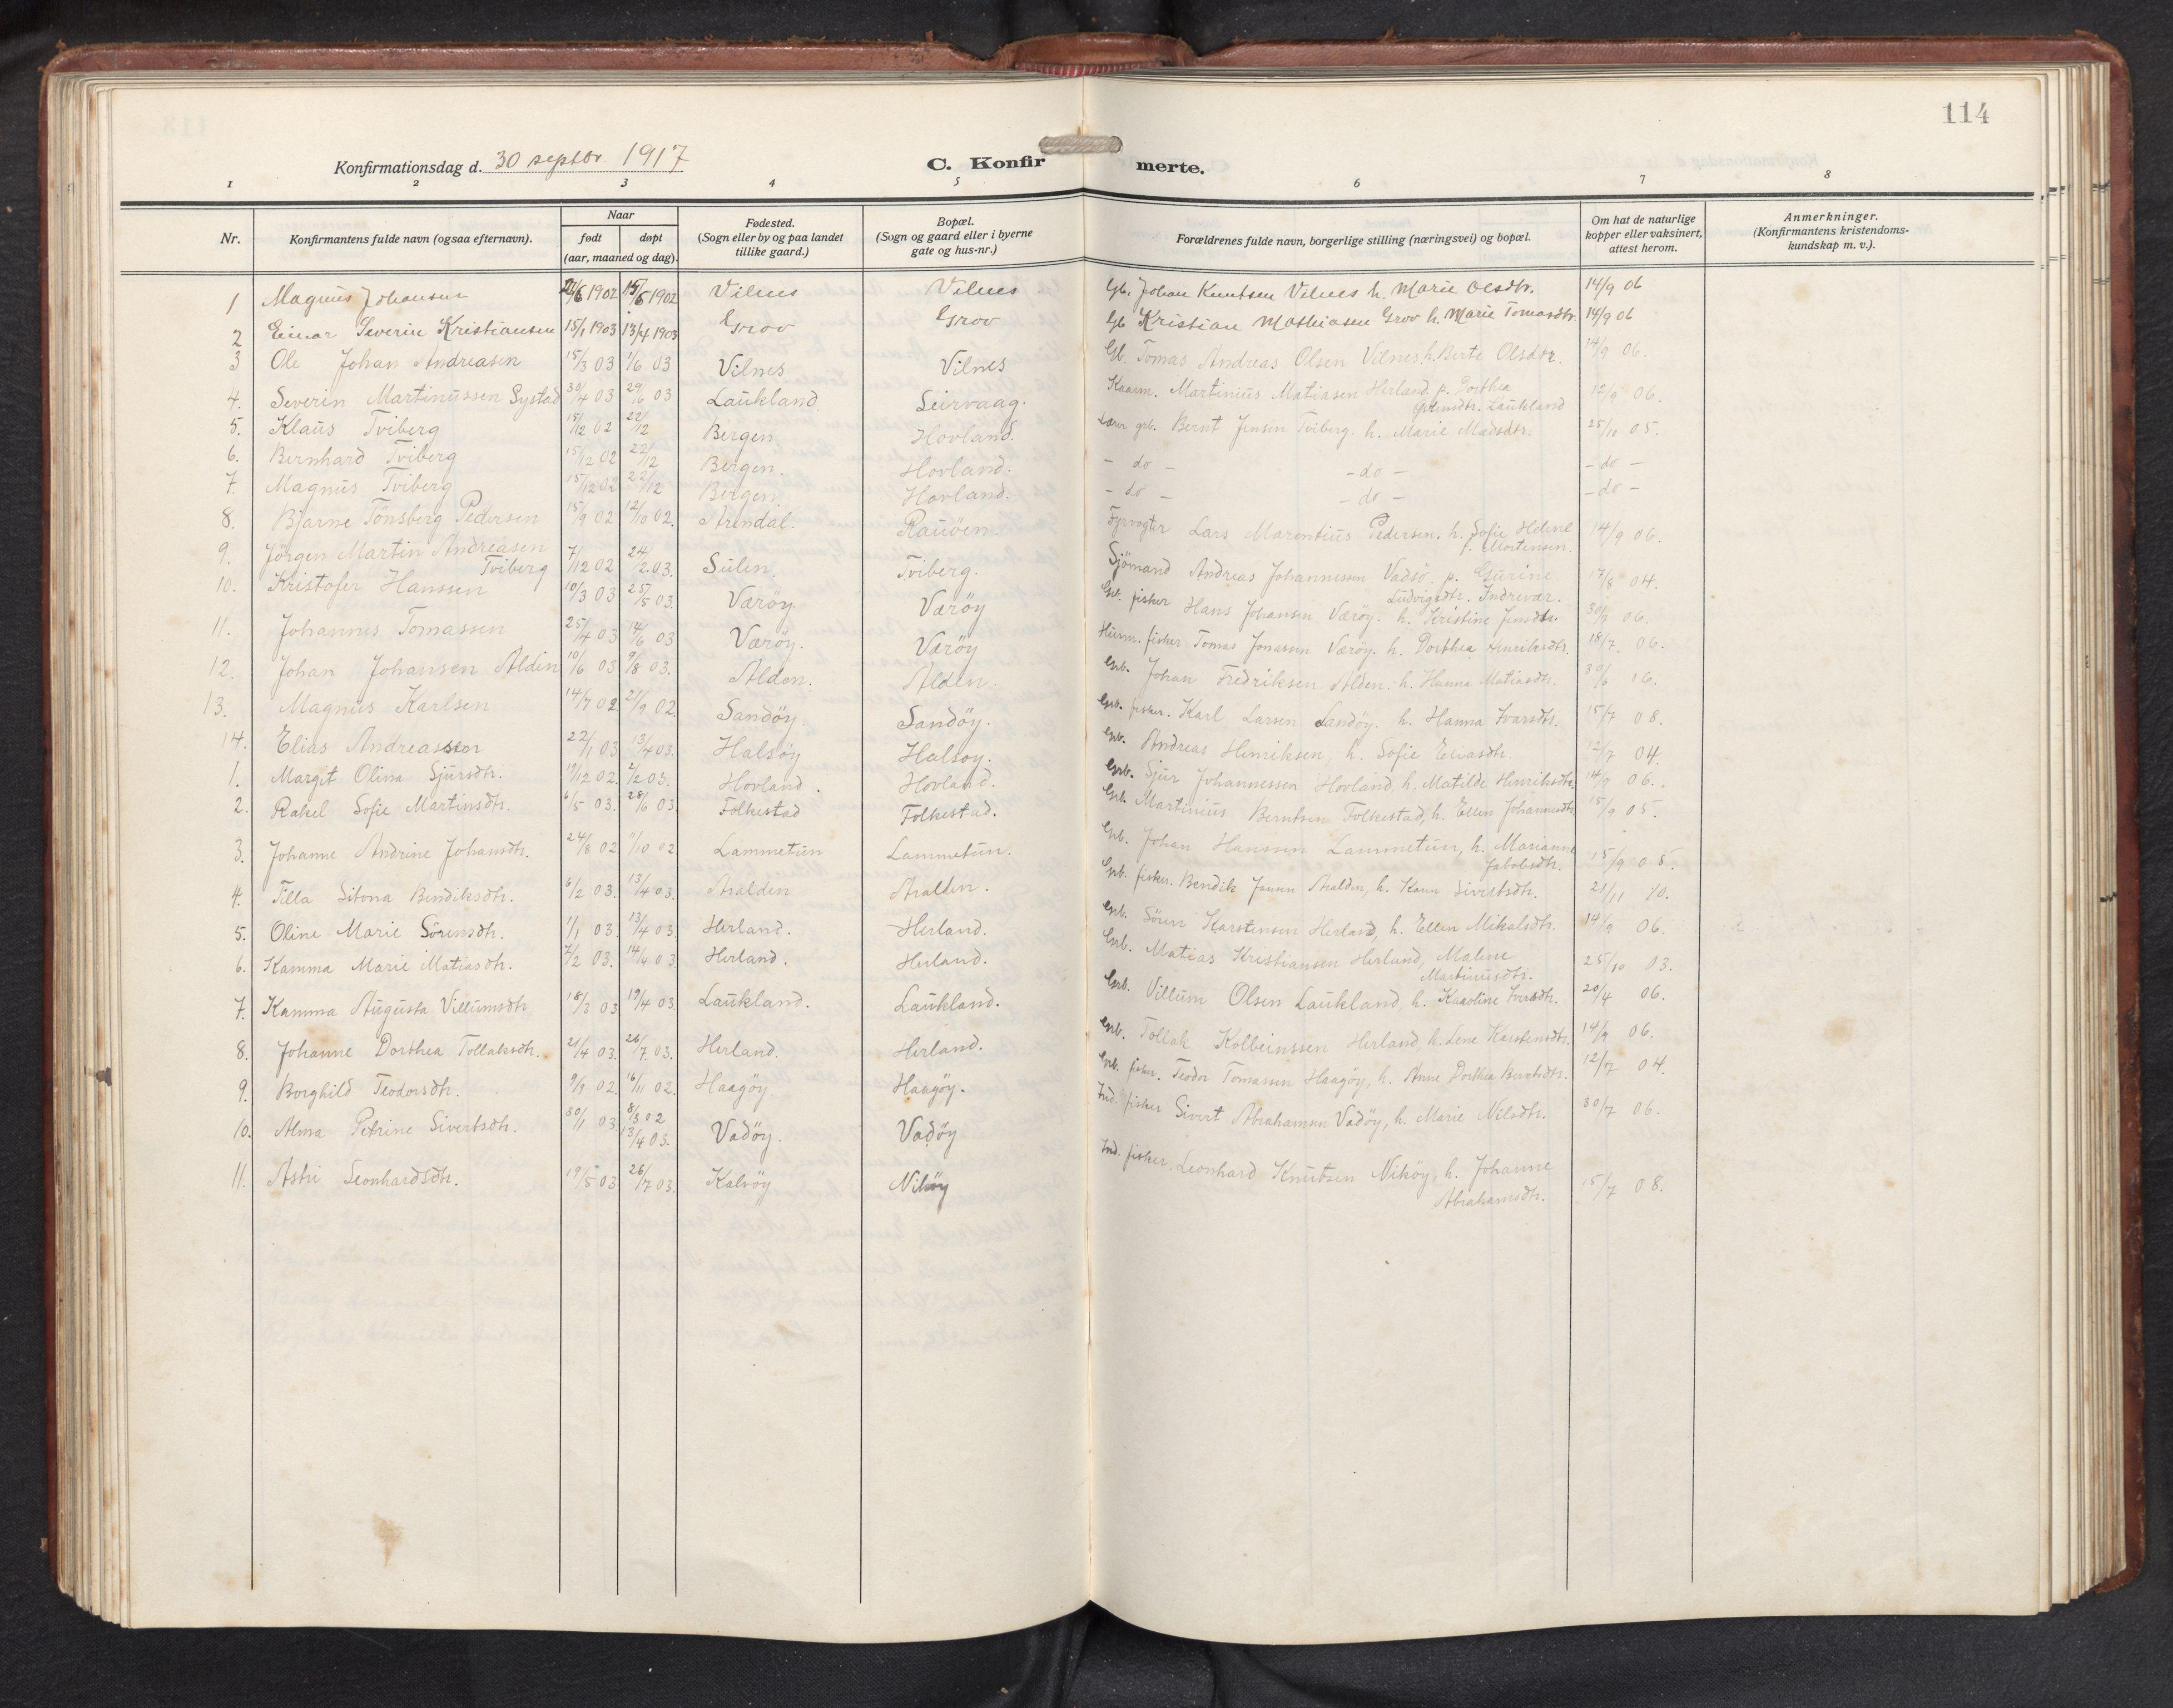 SAB, Askvoll sokneprestembete, H/Hab/Habb/L0002: Klokkerbok nr. B 2, 1910-1947, s. 113b-114a